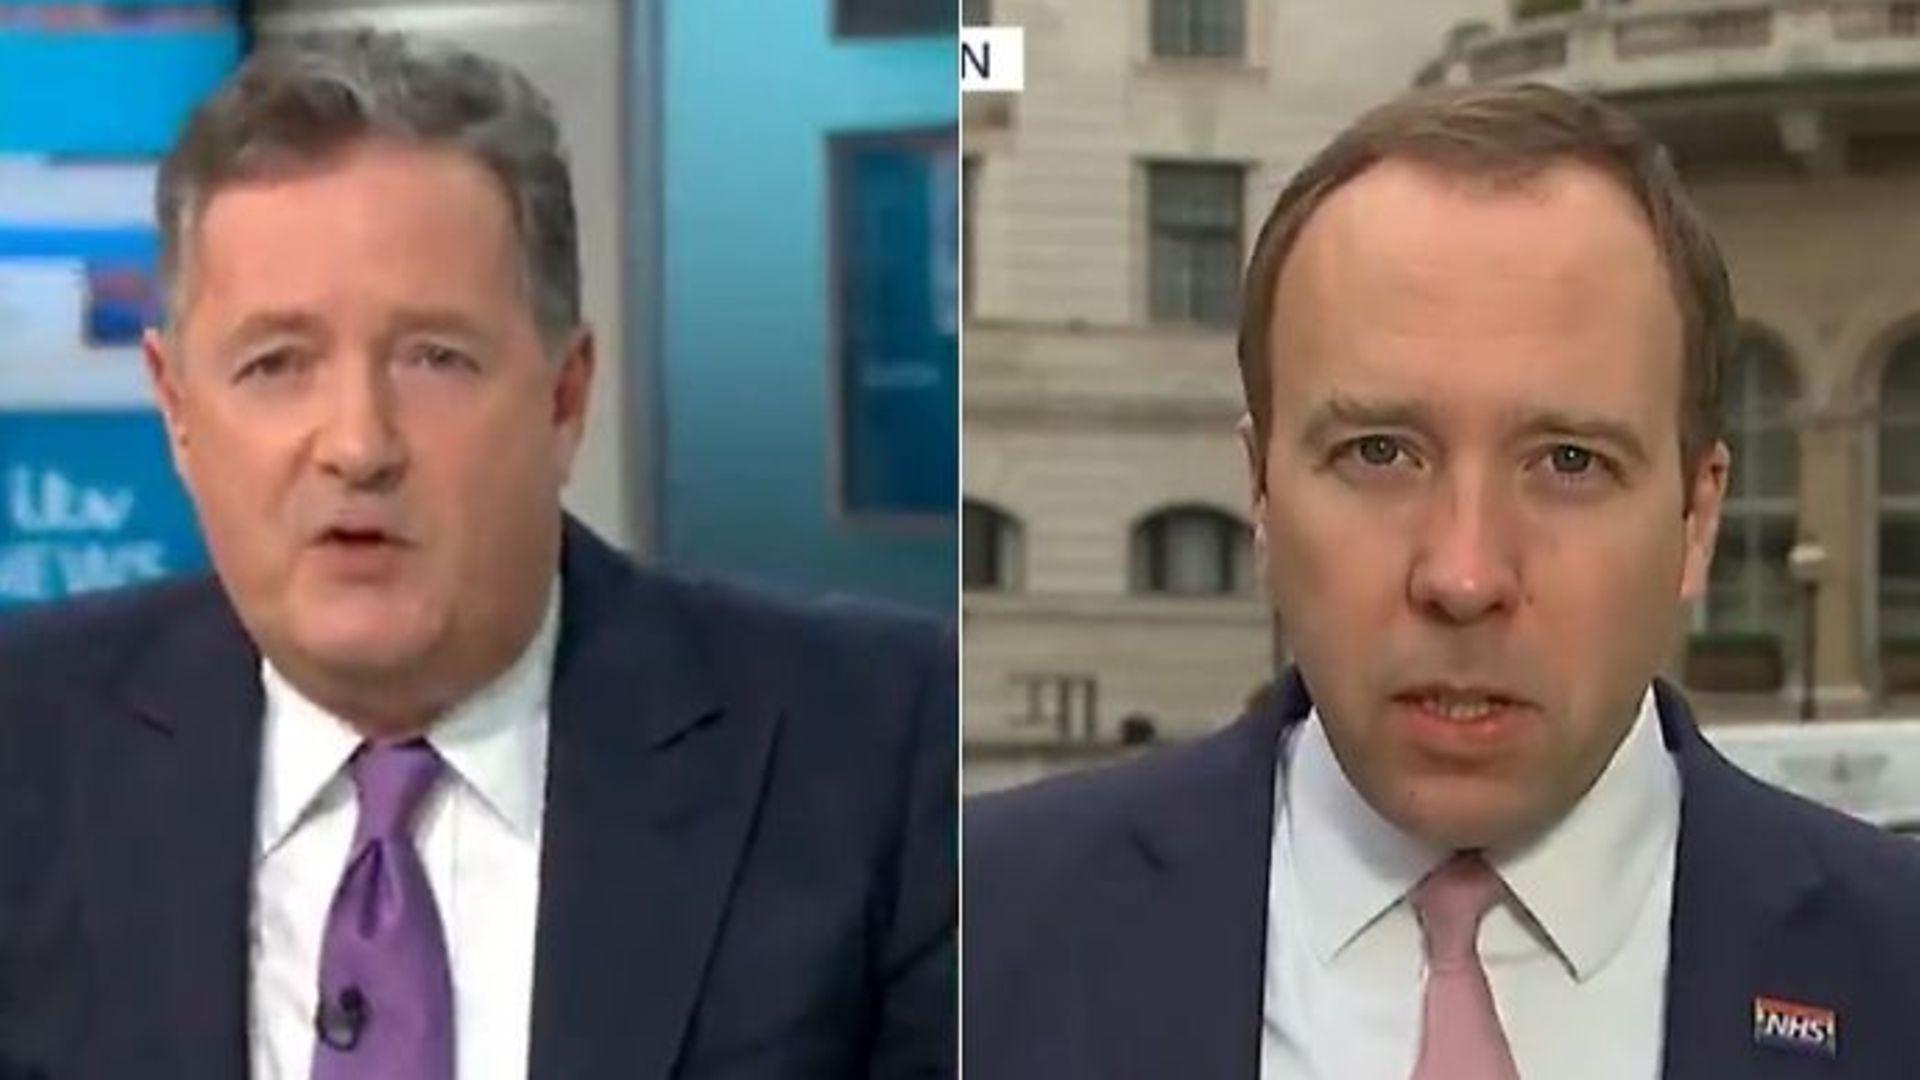 Piers Morgan (L) and health secretary Matt Hancock on Good Morning Britain - Credit: Twitter